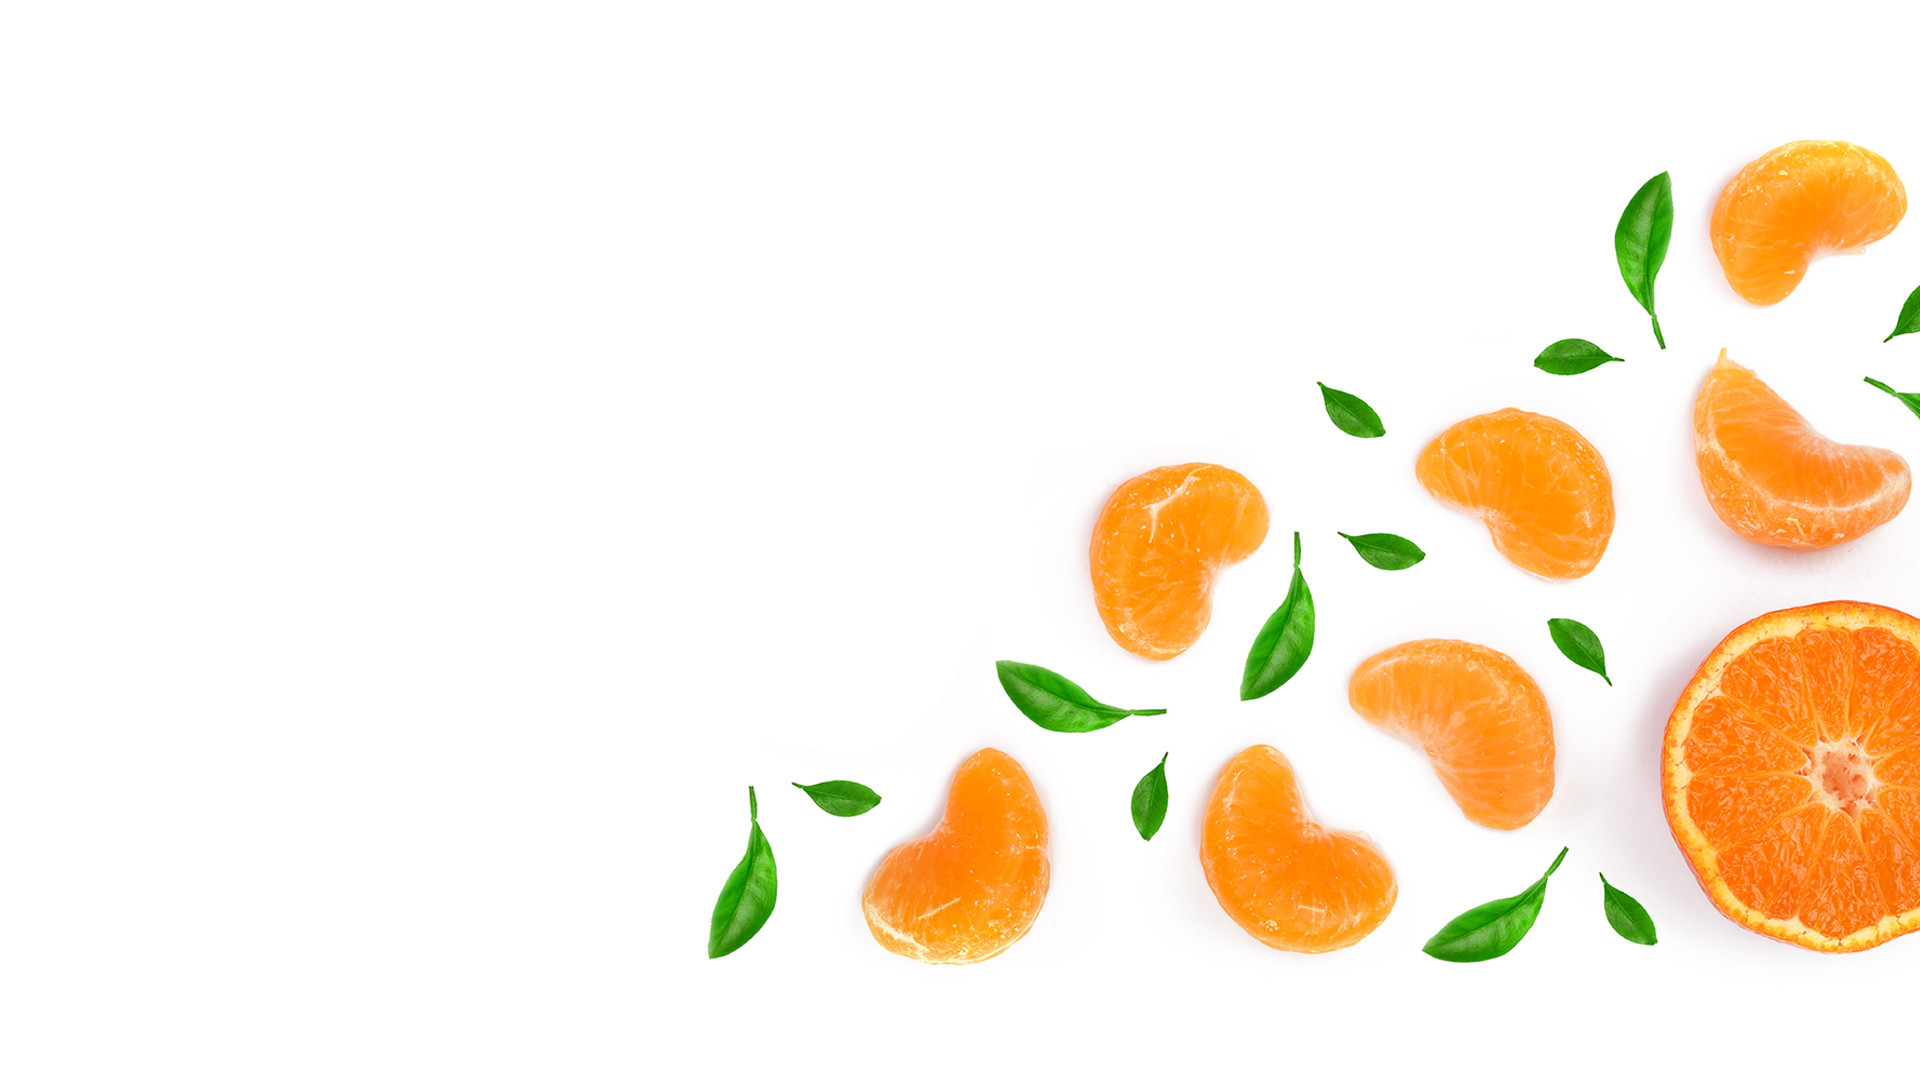 mandarina portada incio.jpg